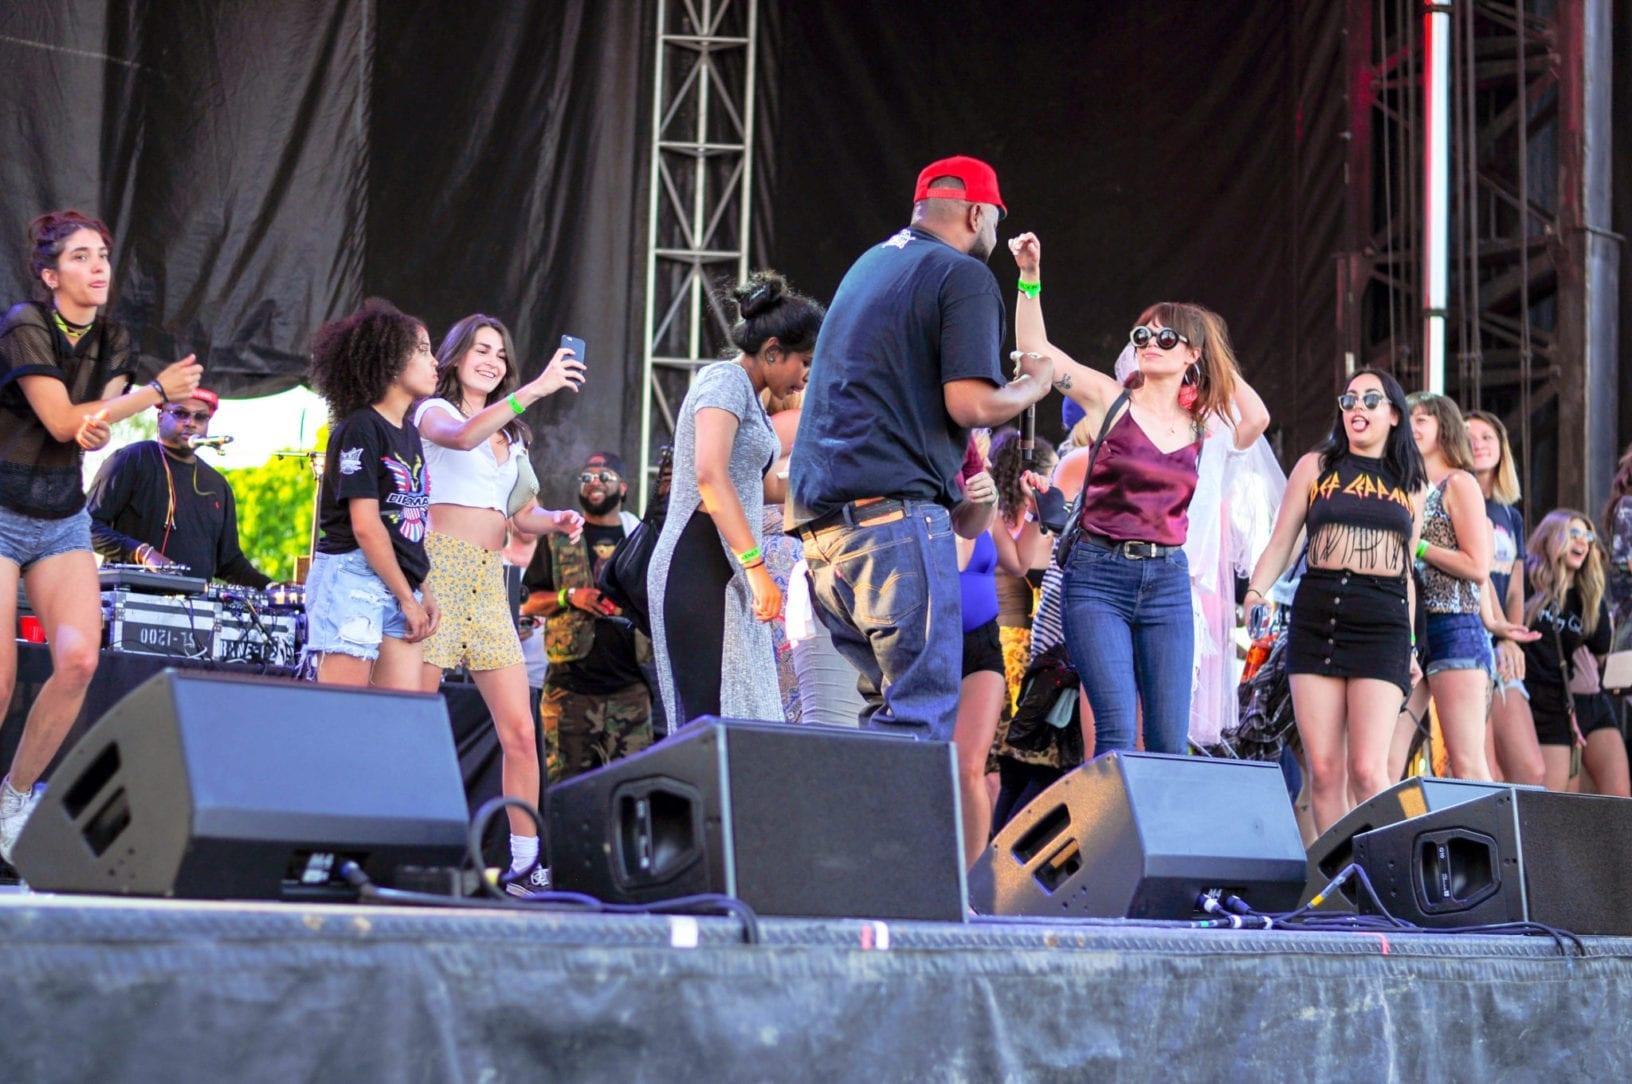 Ghostface Killah NXNE 2016 Toronto Girls on Stage